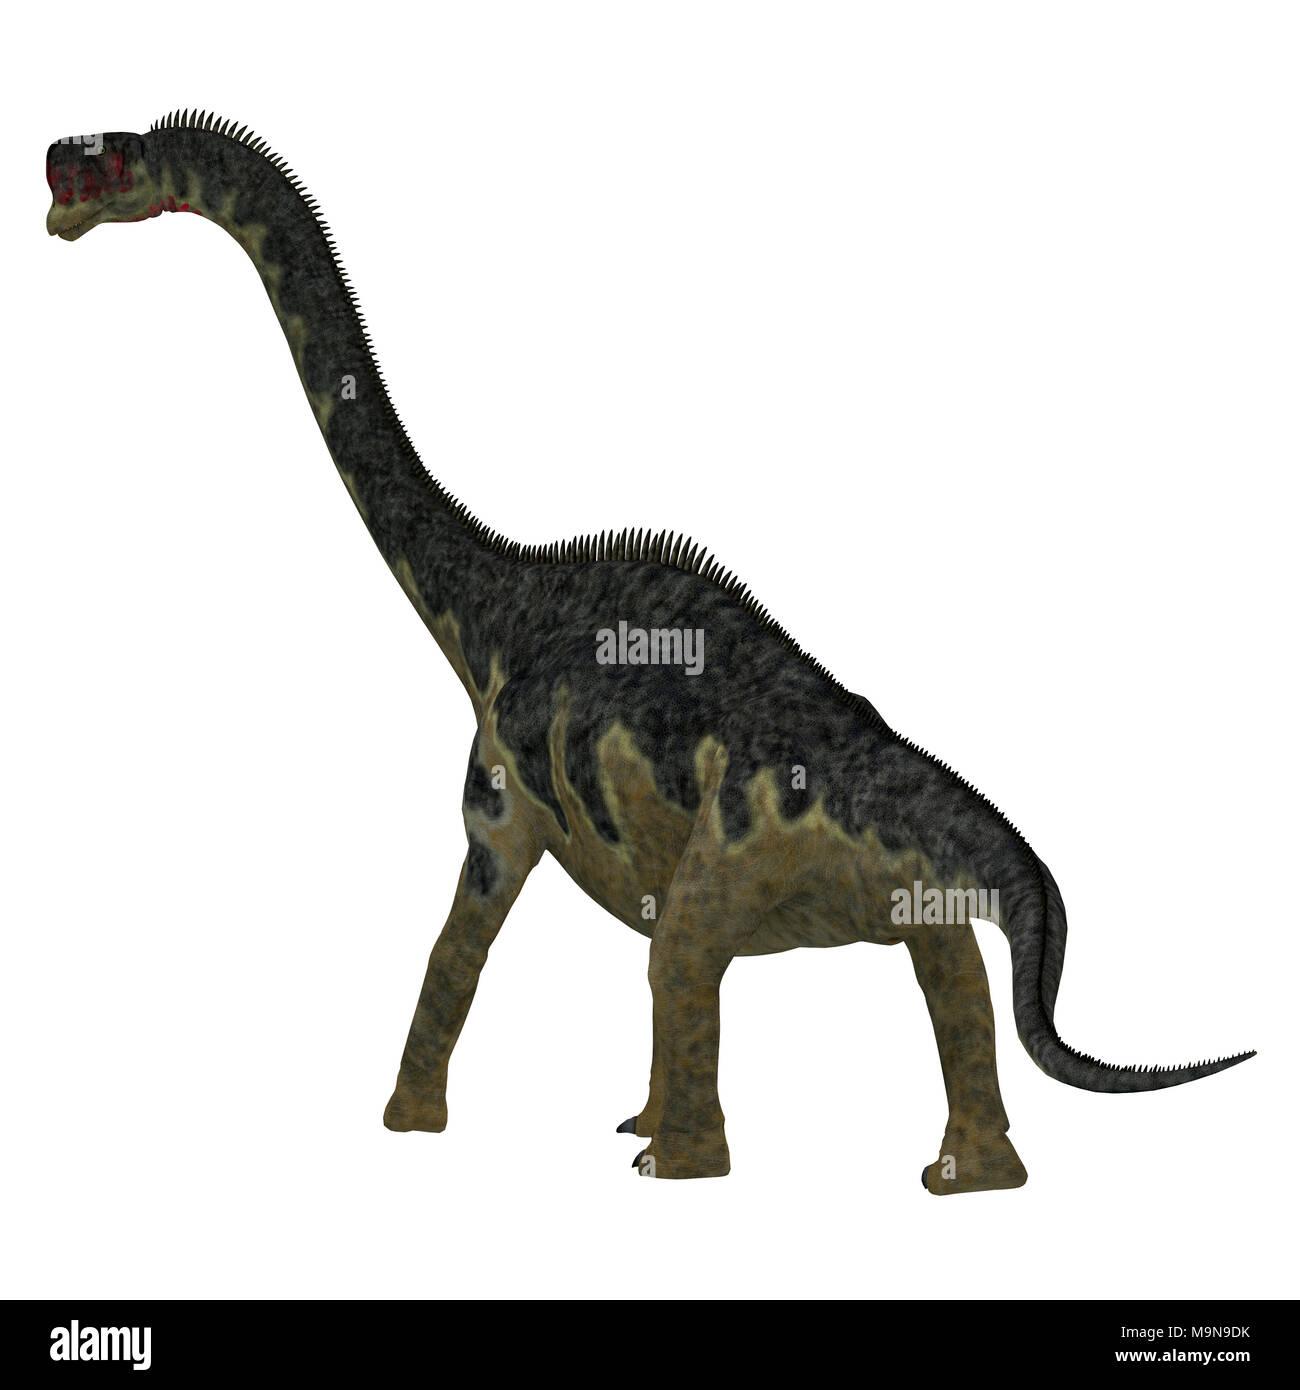 Europasaurus Dinosaur Tail - Europasaurus was a sauropod herbivorous dinosaur that lived in Germany, Europe during the Jurassic Period. - Stock Image